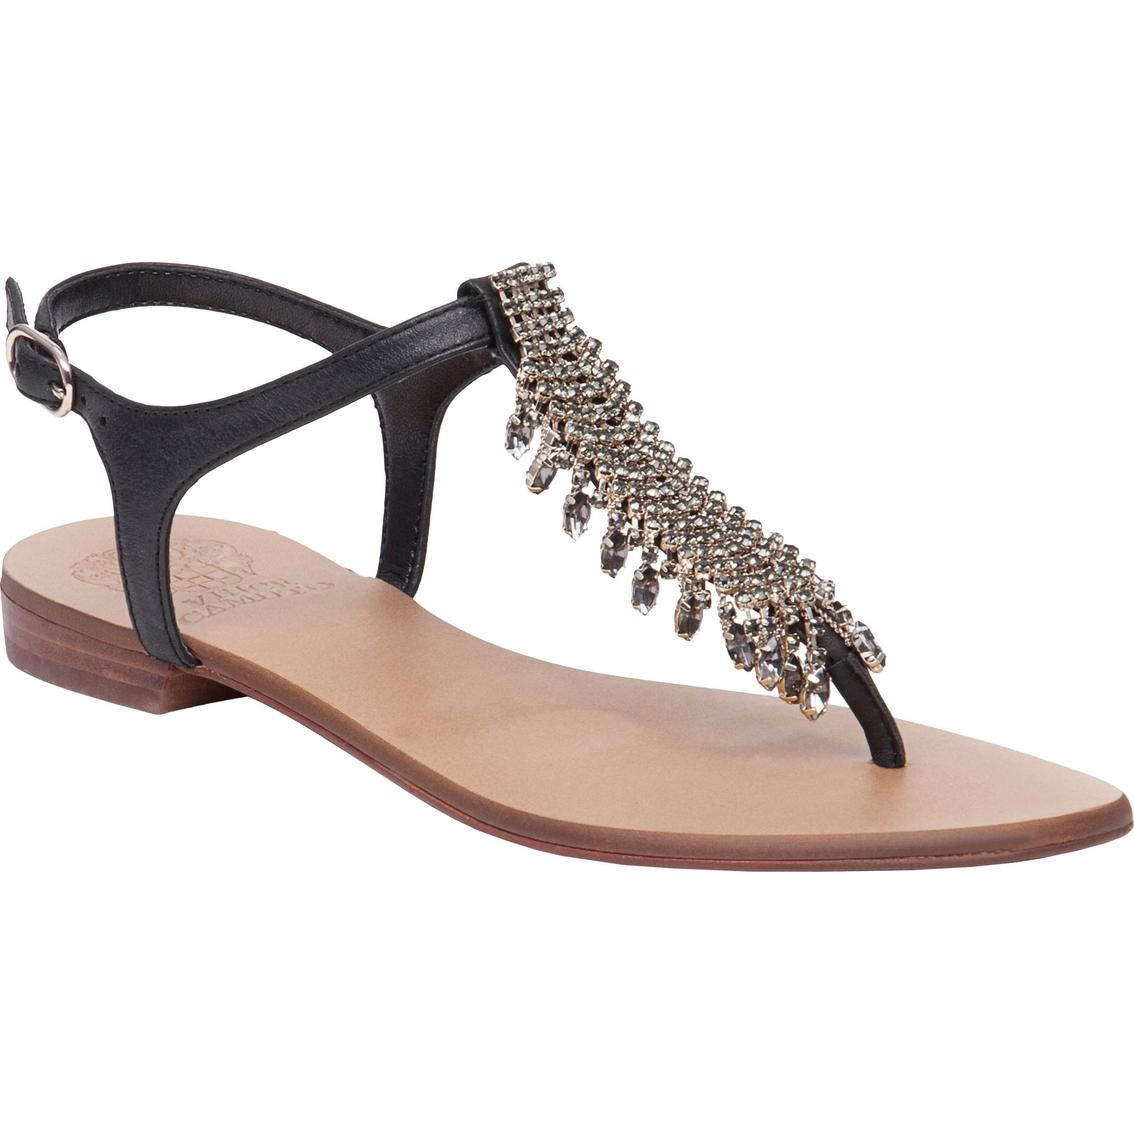 e204b5d10 Vince Camuto Jachai Rhinestone Embellished Thong Sandal